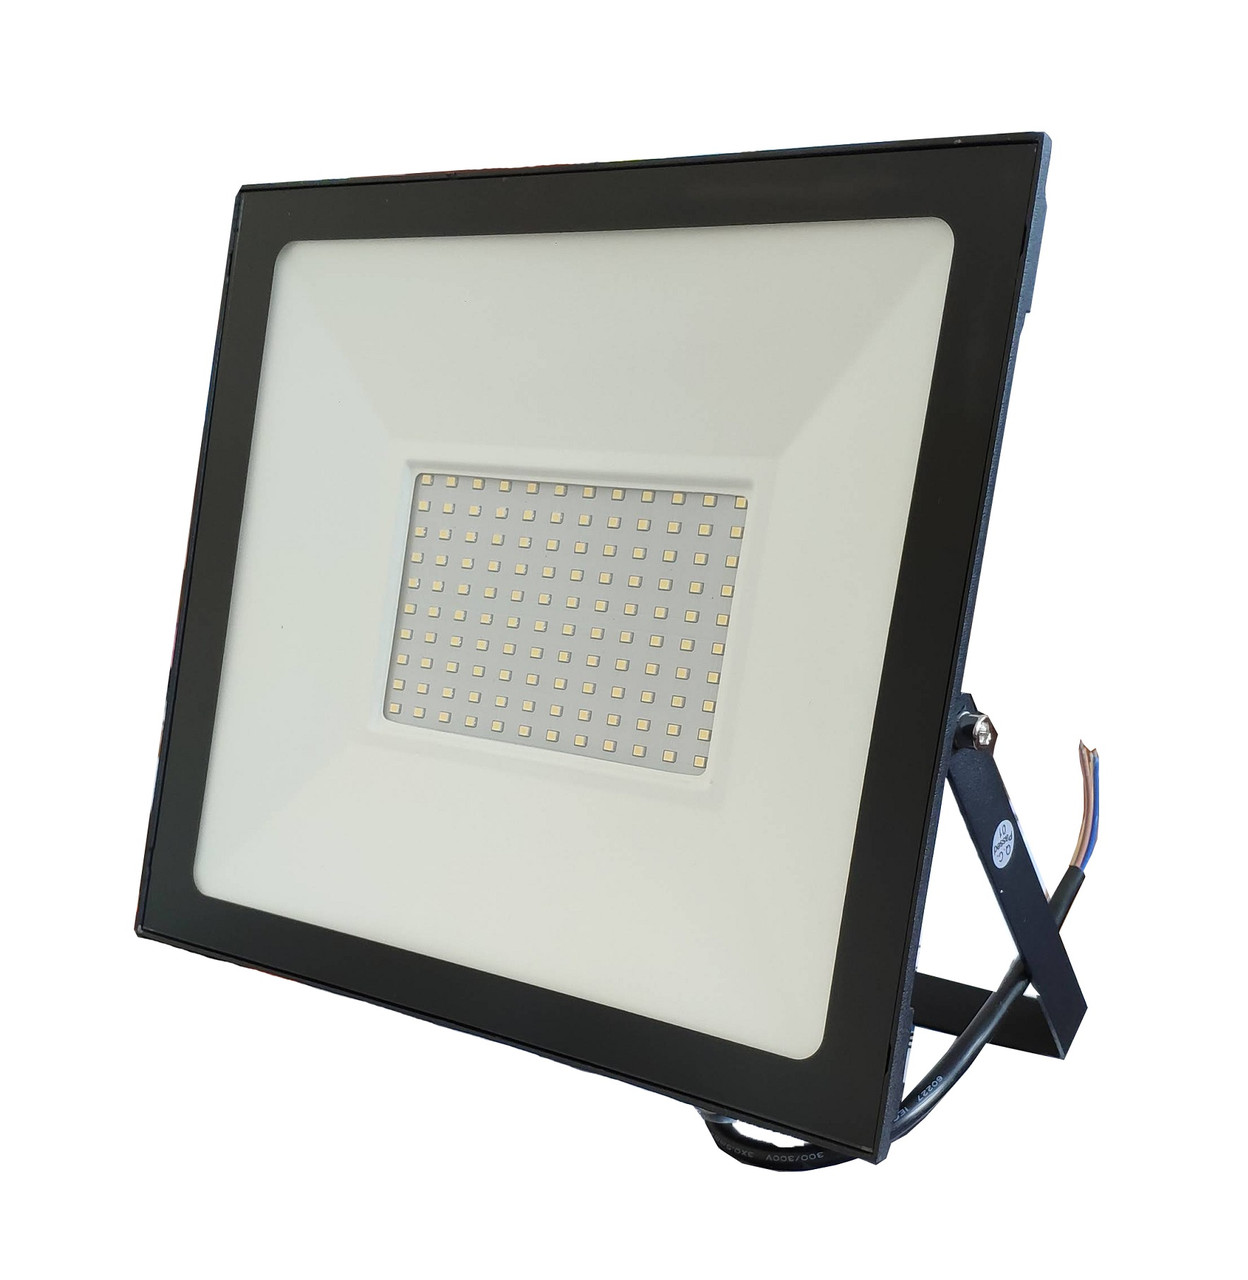 Прожектор LED 100W ECO Slim  220V 7000Lm 6500K IP65 TNSy